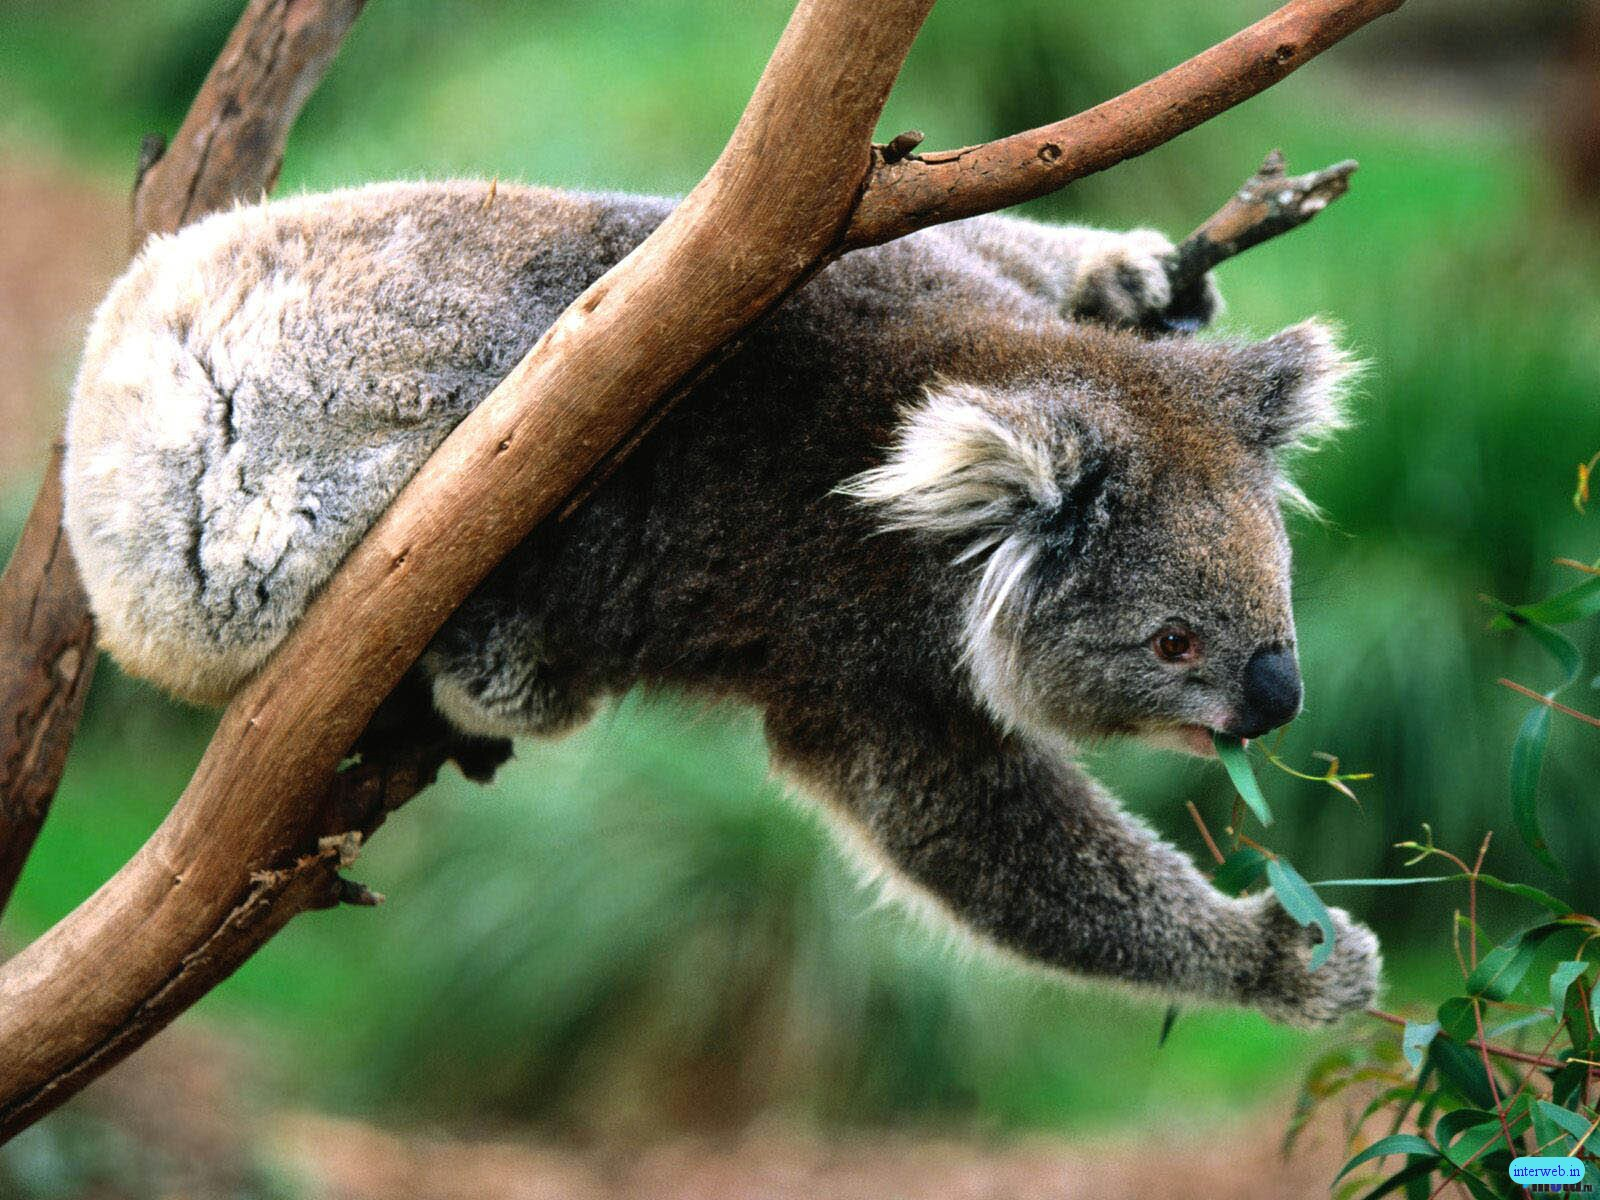 http://3.bp.blogspot.com/-V9WDecZYzYs/UHB5akdSw7I/AAAAAAAAG0s/RgOwRTPSQ-M/s1600/animals+Images.jpg